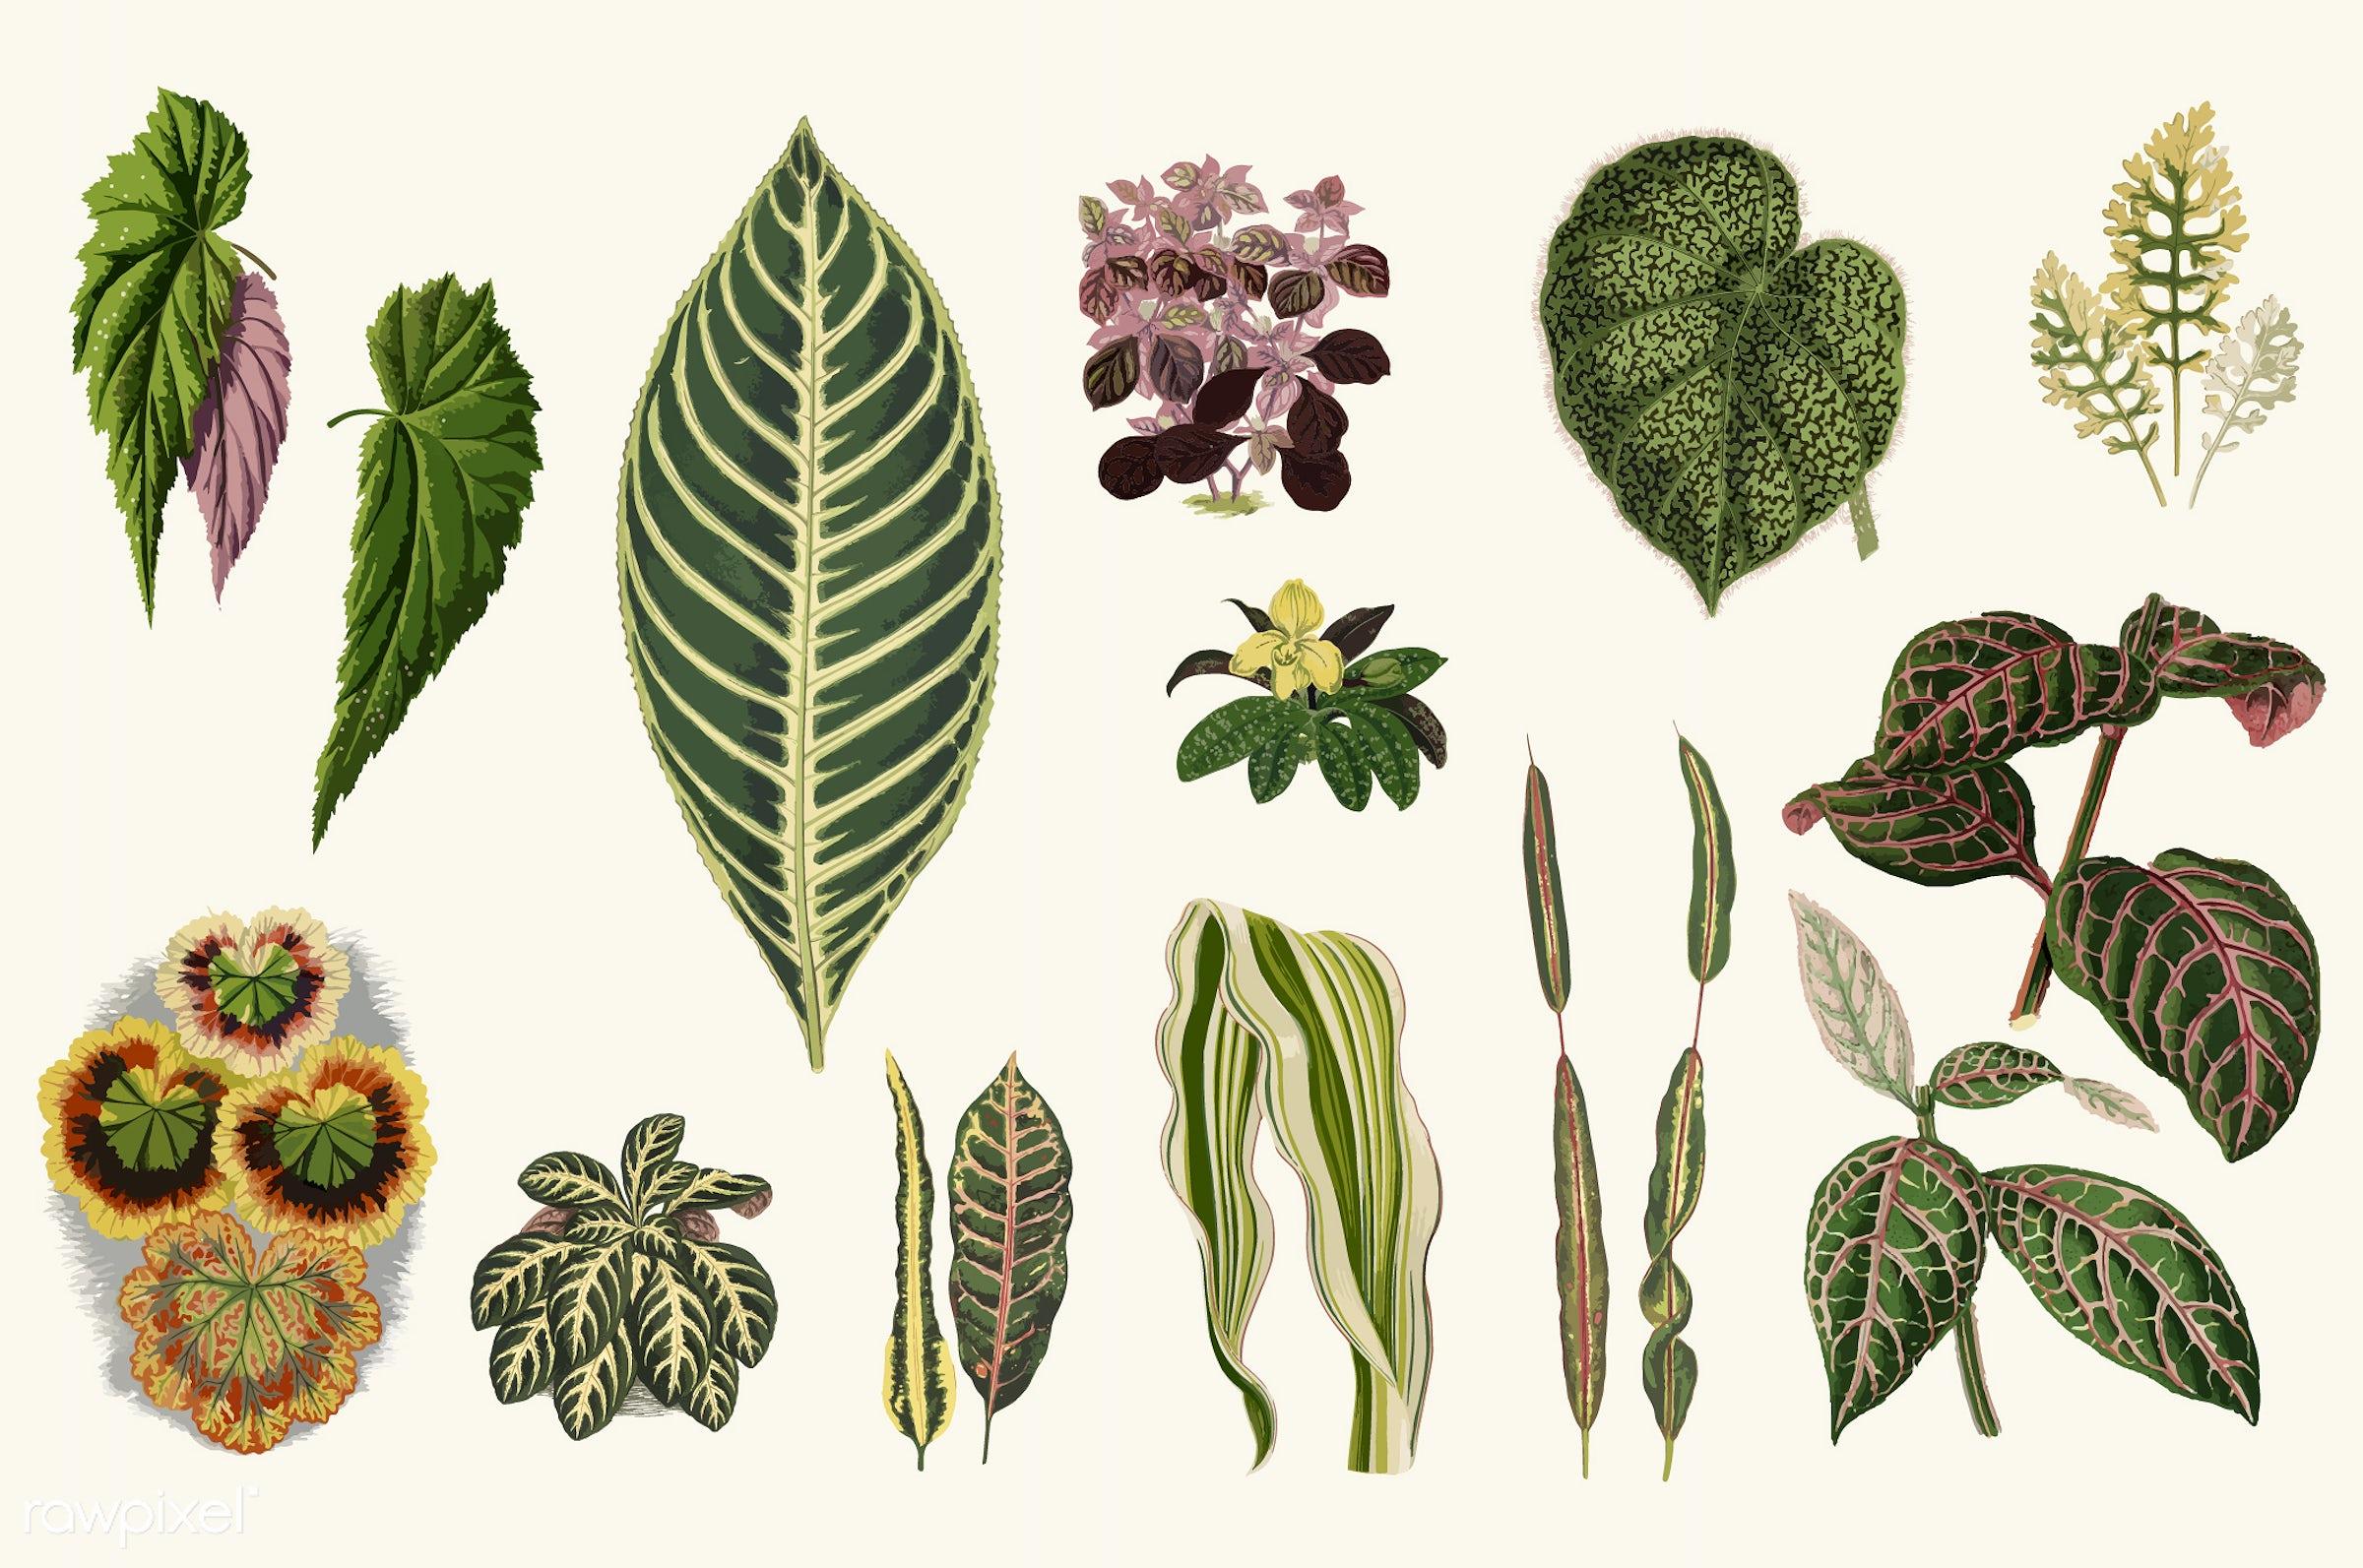 leaf, plant, alternanthera ficoides, ancient, antique, aphelandra maculata, begonia, begonia falcifolia, begonia strigillosa...